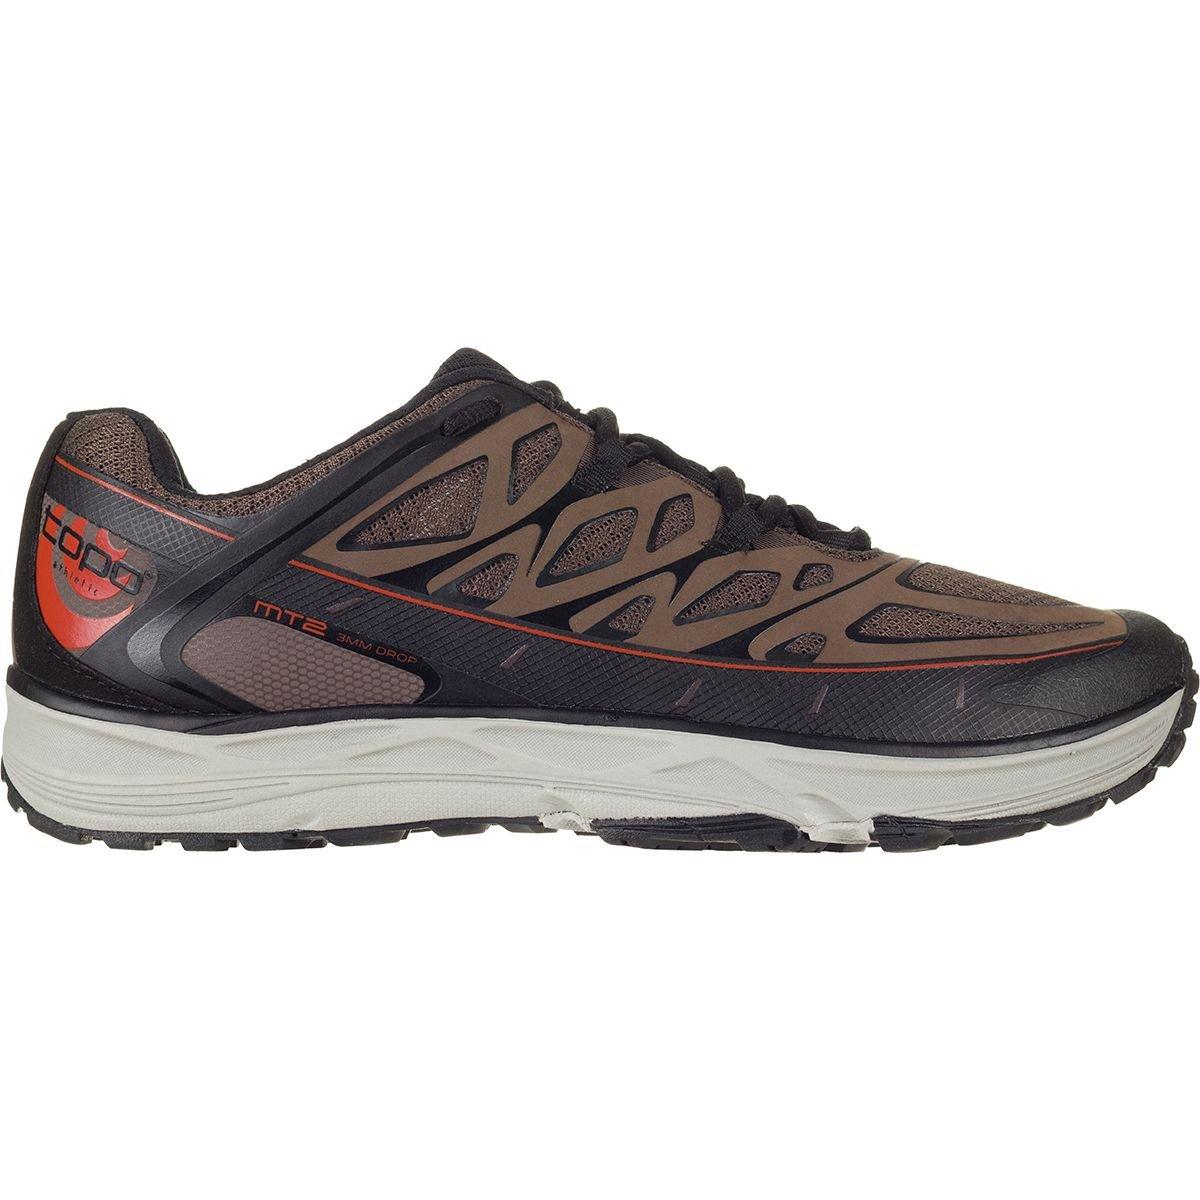 Topo Athletic MT2 Running Shoe - Men's B06VXCV6TS 10.5 D(M) US|Brown/Black